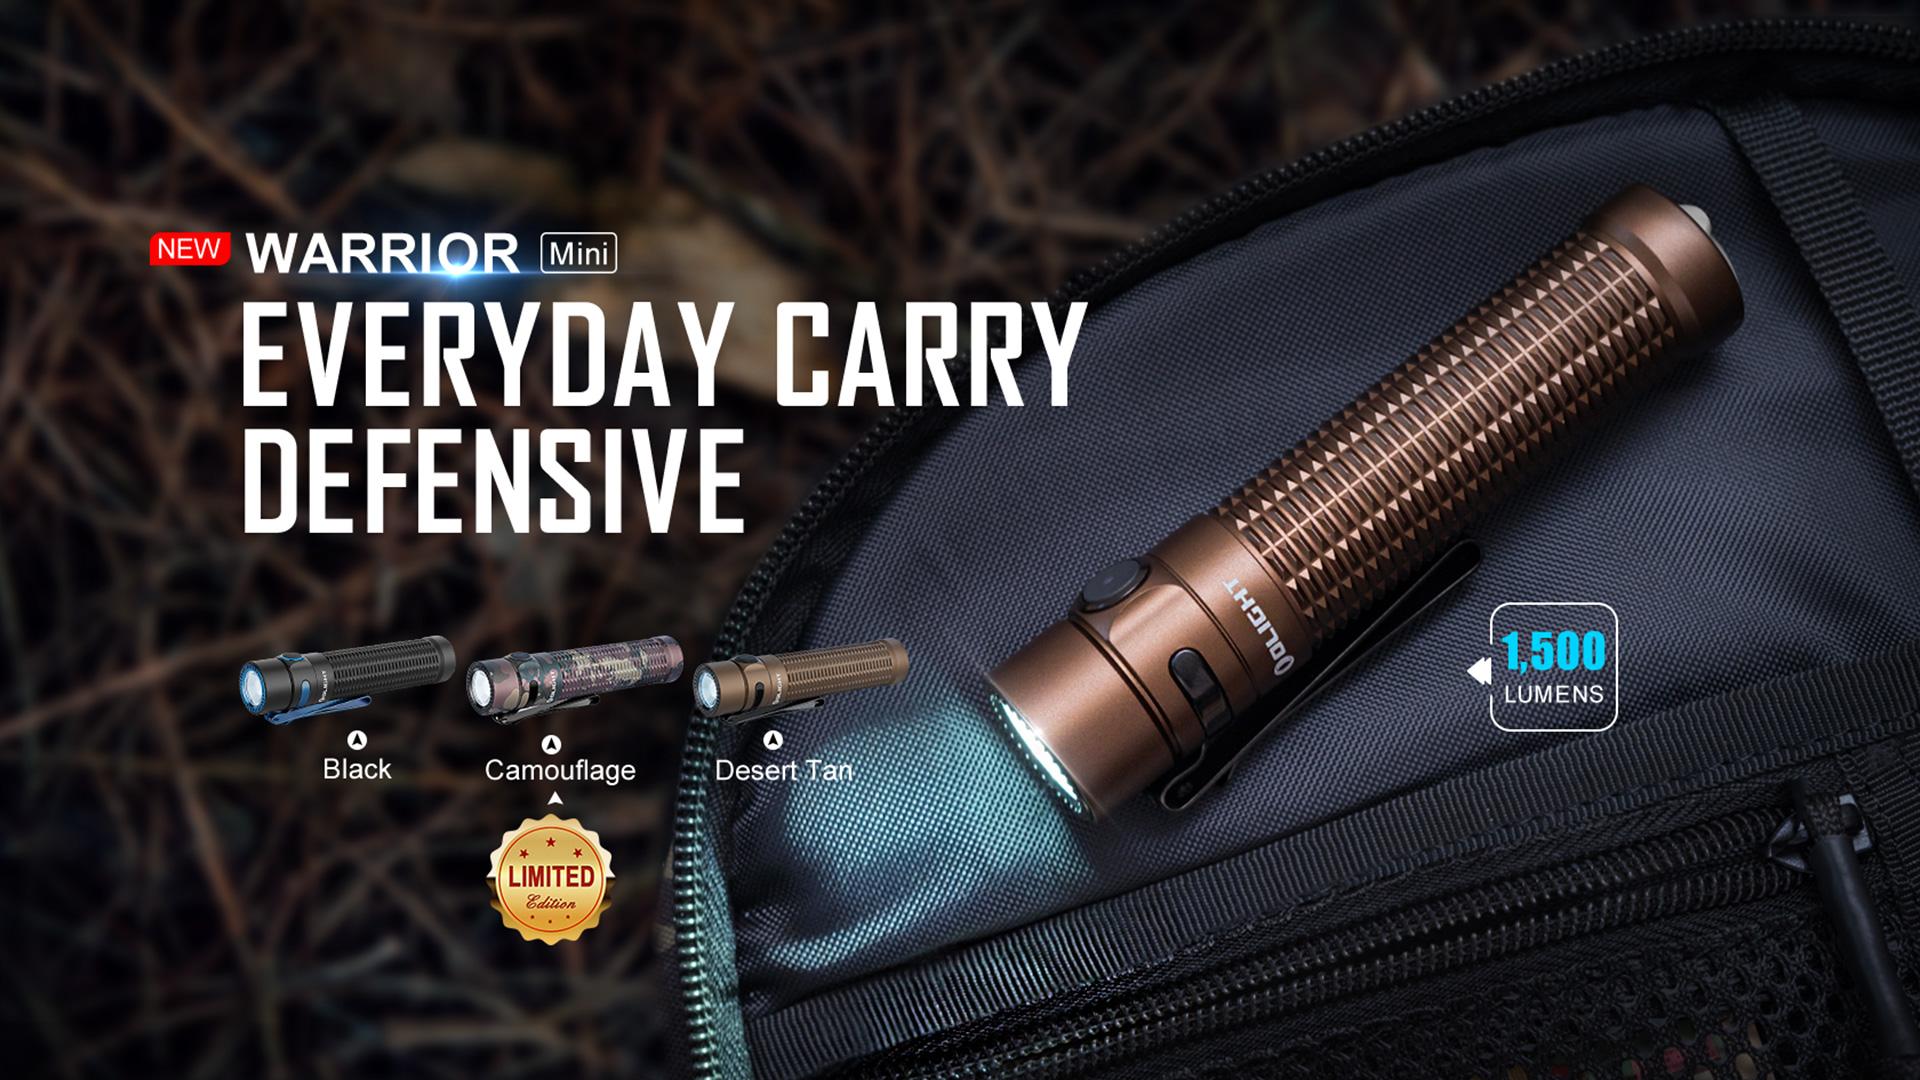 Olight Warrior Mini – A Super Powerful EDC Torch